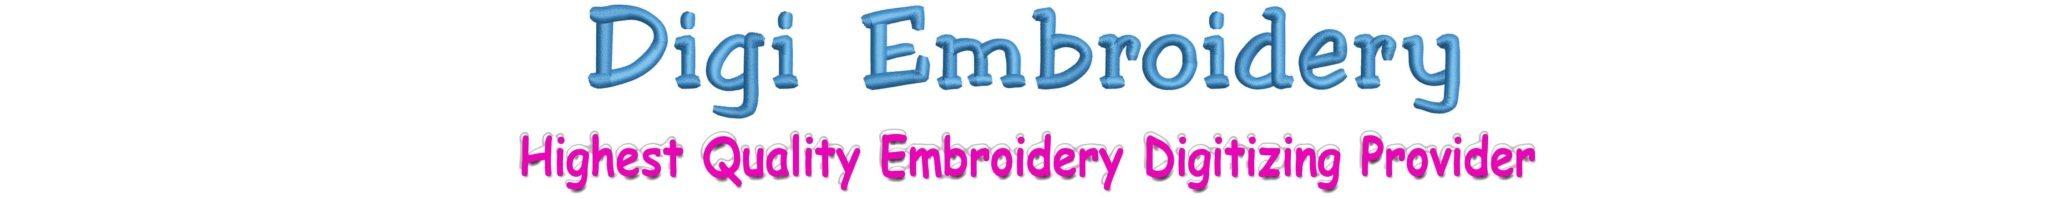 Digi Embroidery